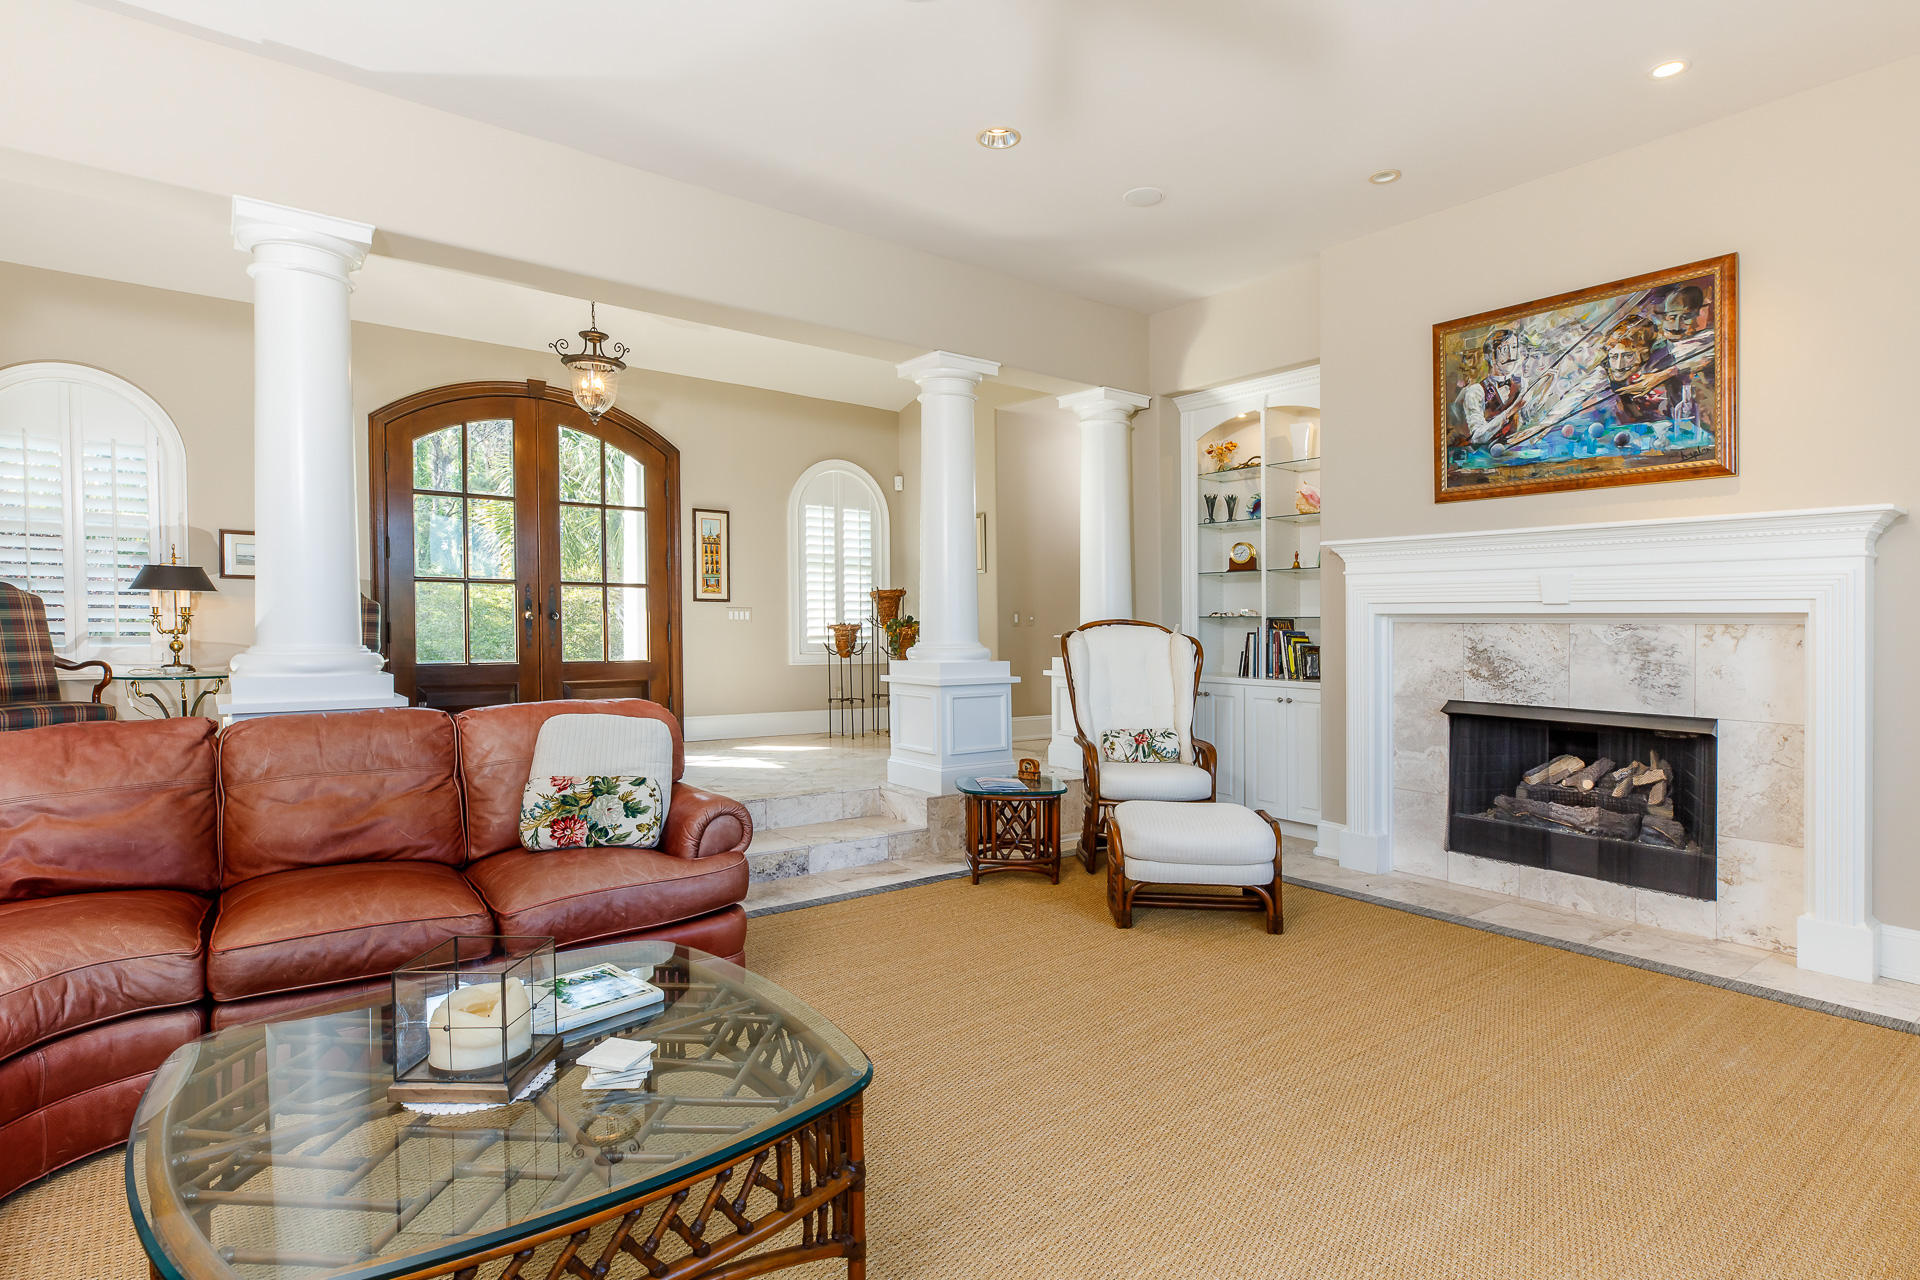 Seabrook Island Homes For Sale - 2216 Rolling Dune, Seabrook Island, SC - 43